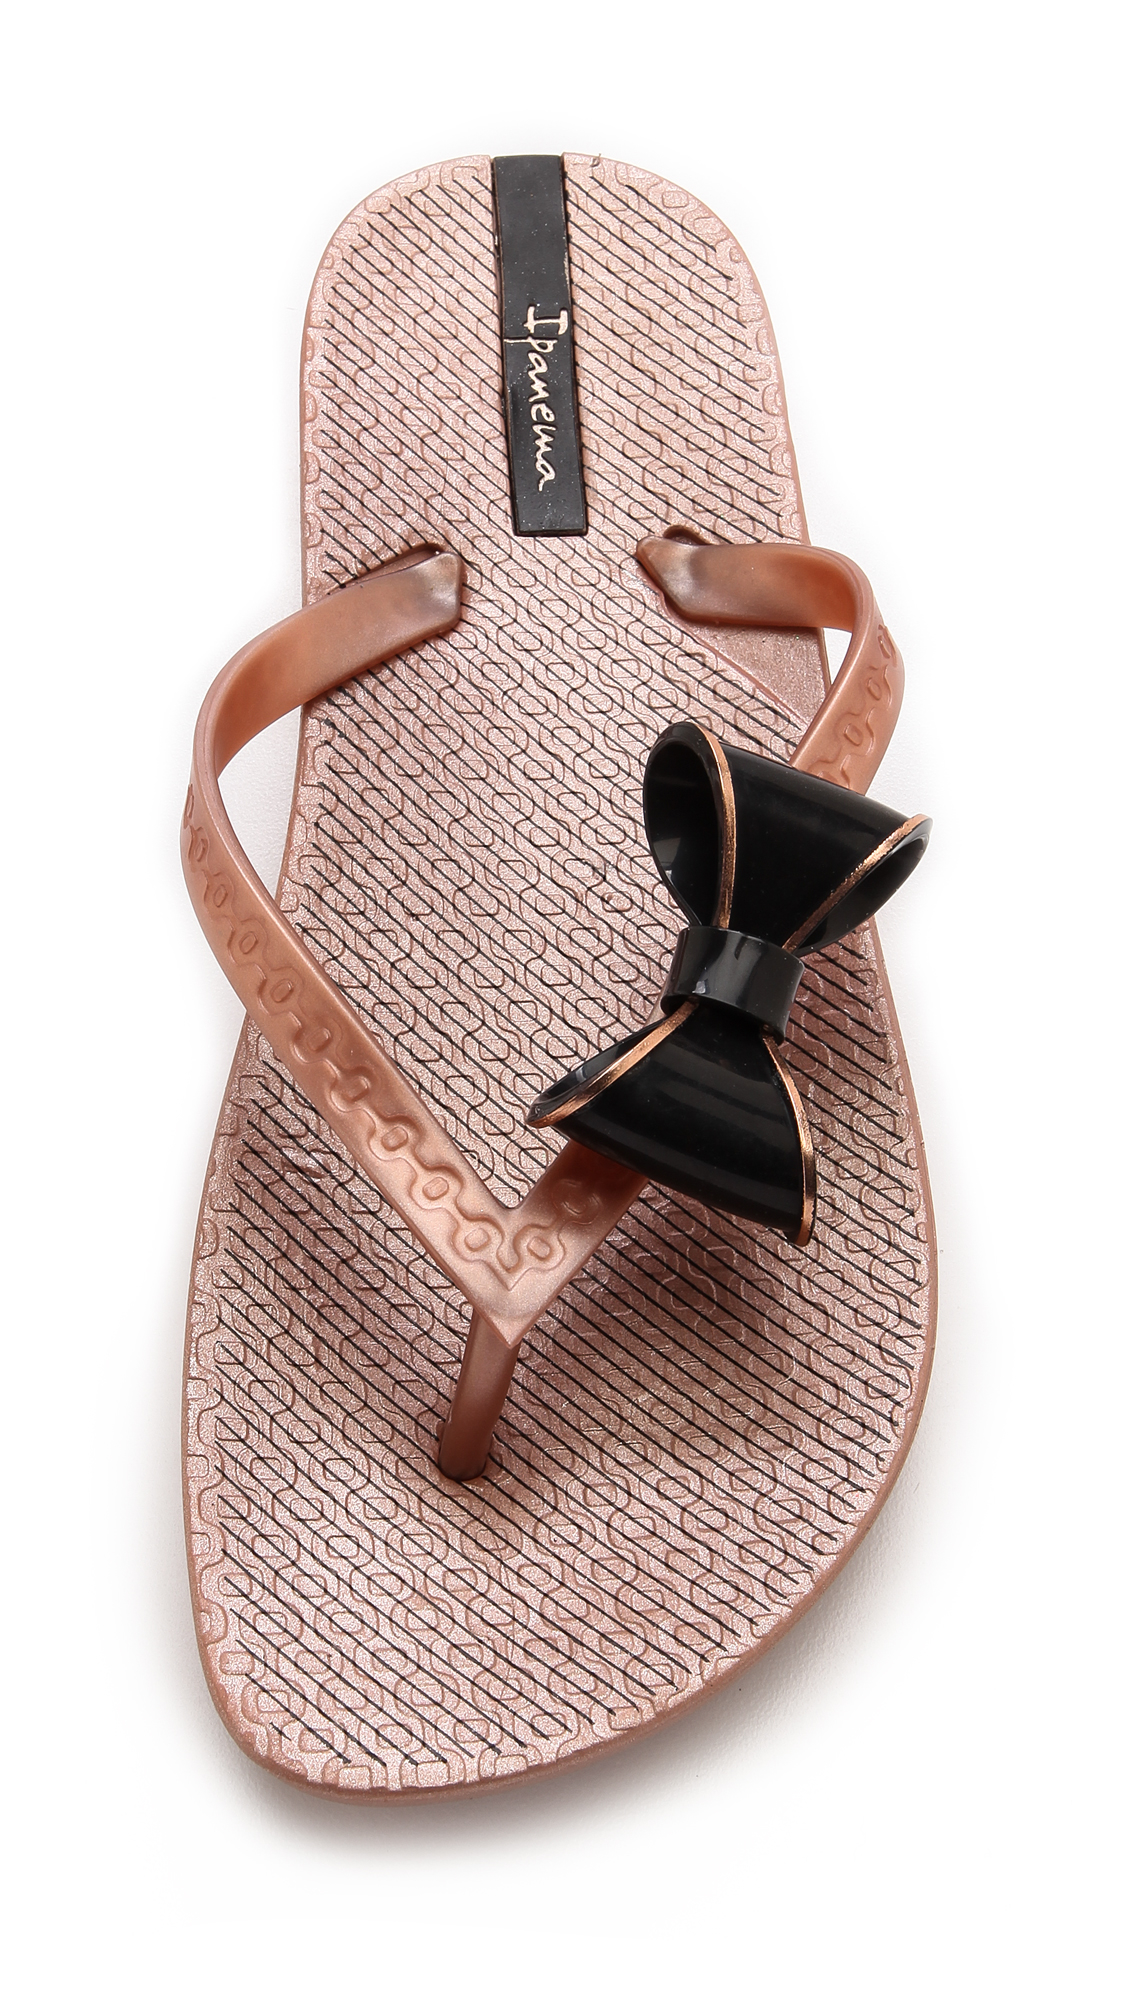 63ac068f2ce10 Lyst - Ipanema Neo Clara Bow Flip Flops - Rose Gold Black in Metallic